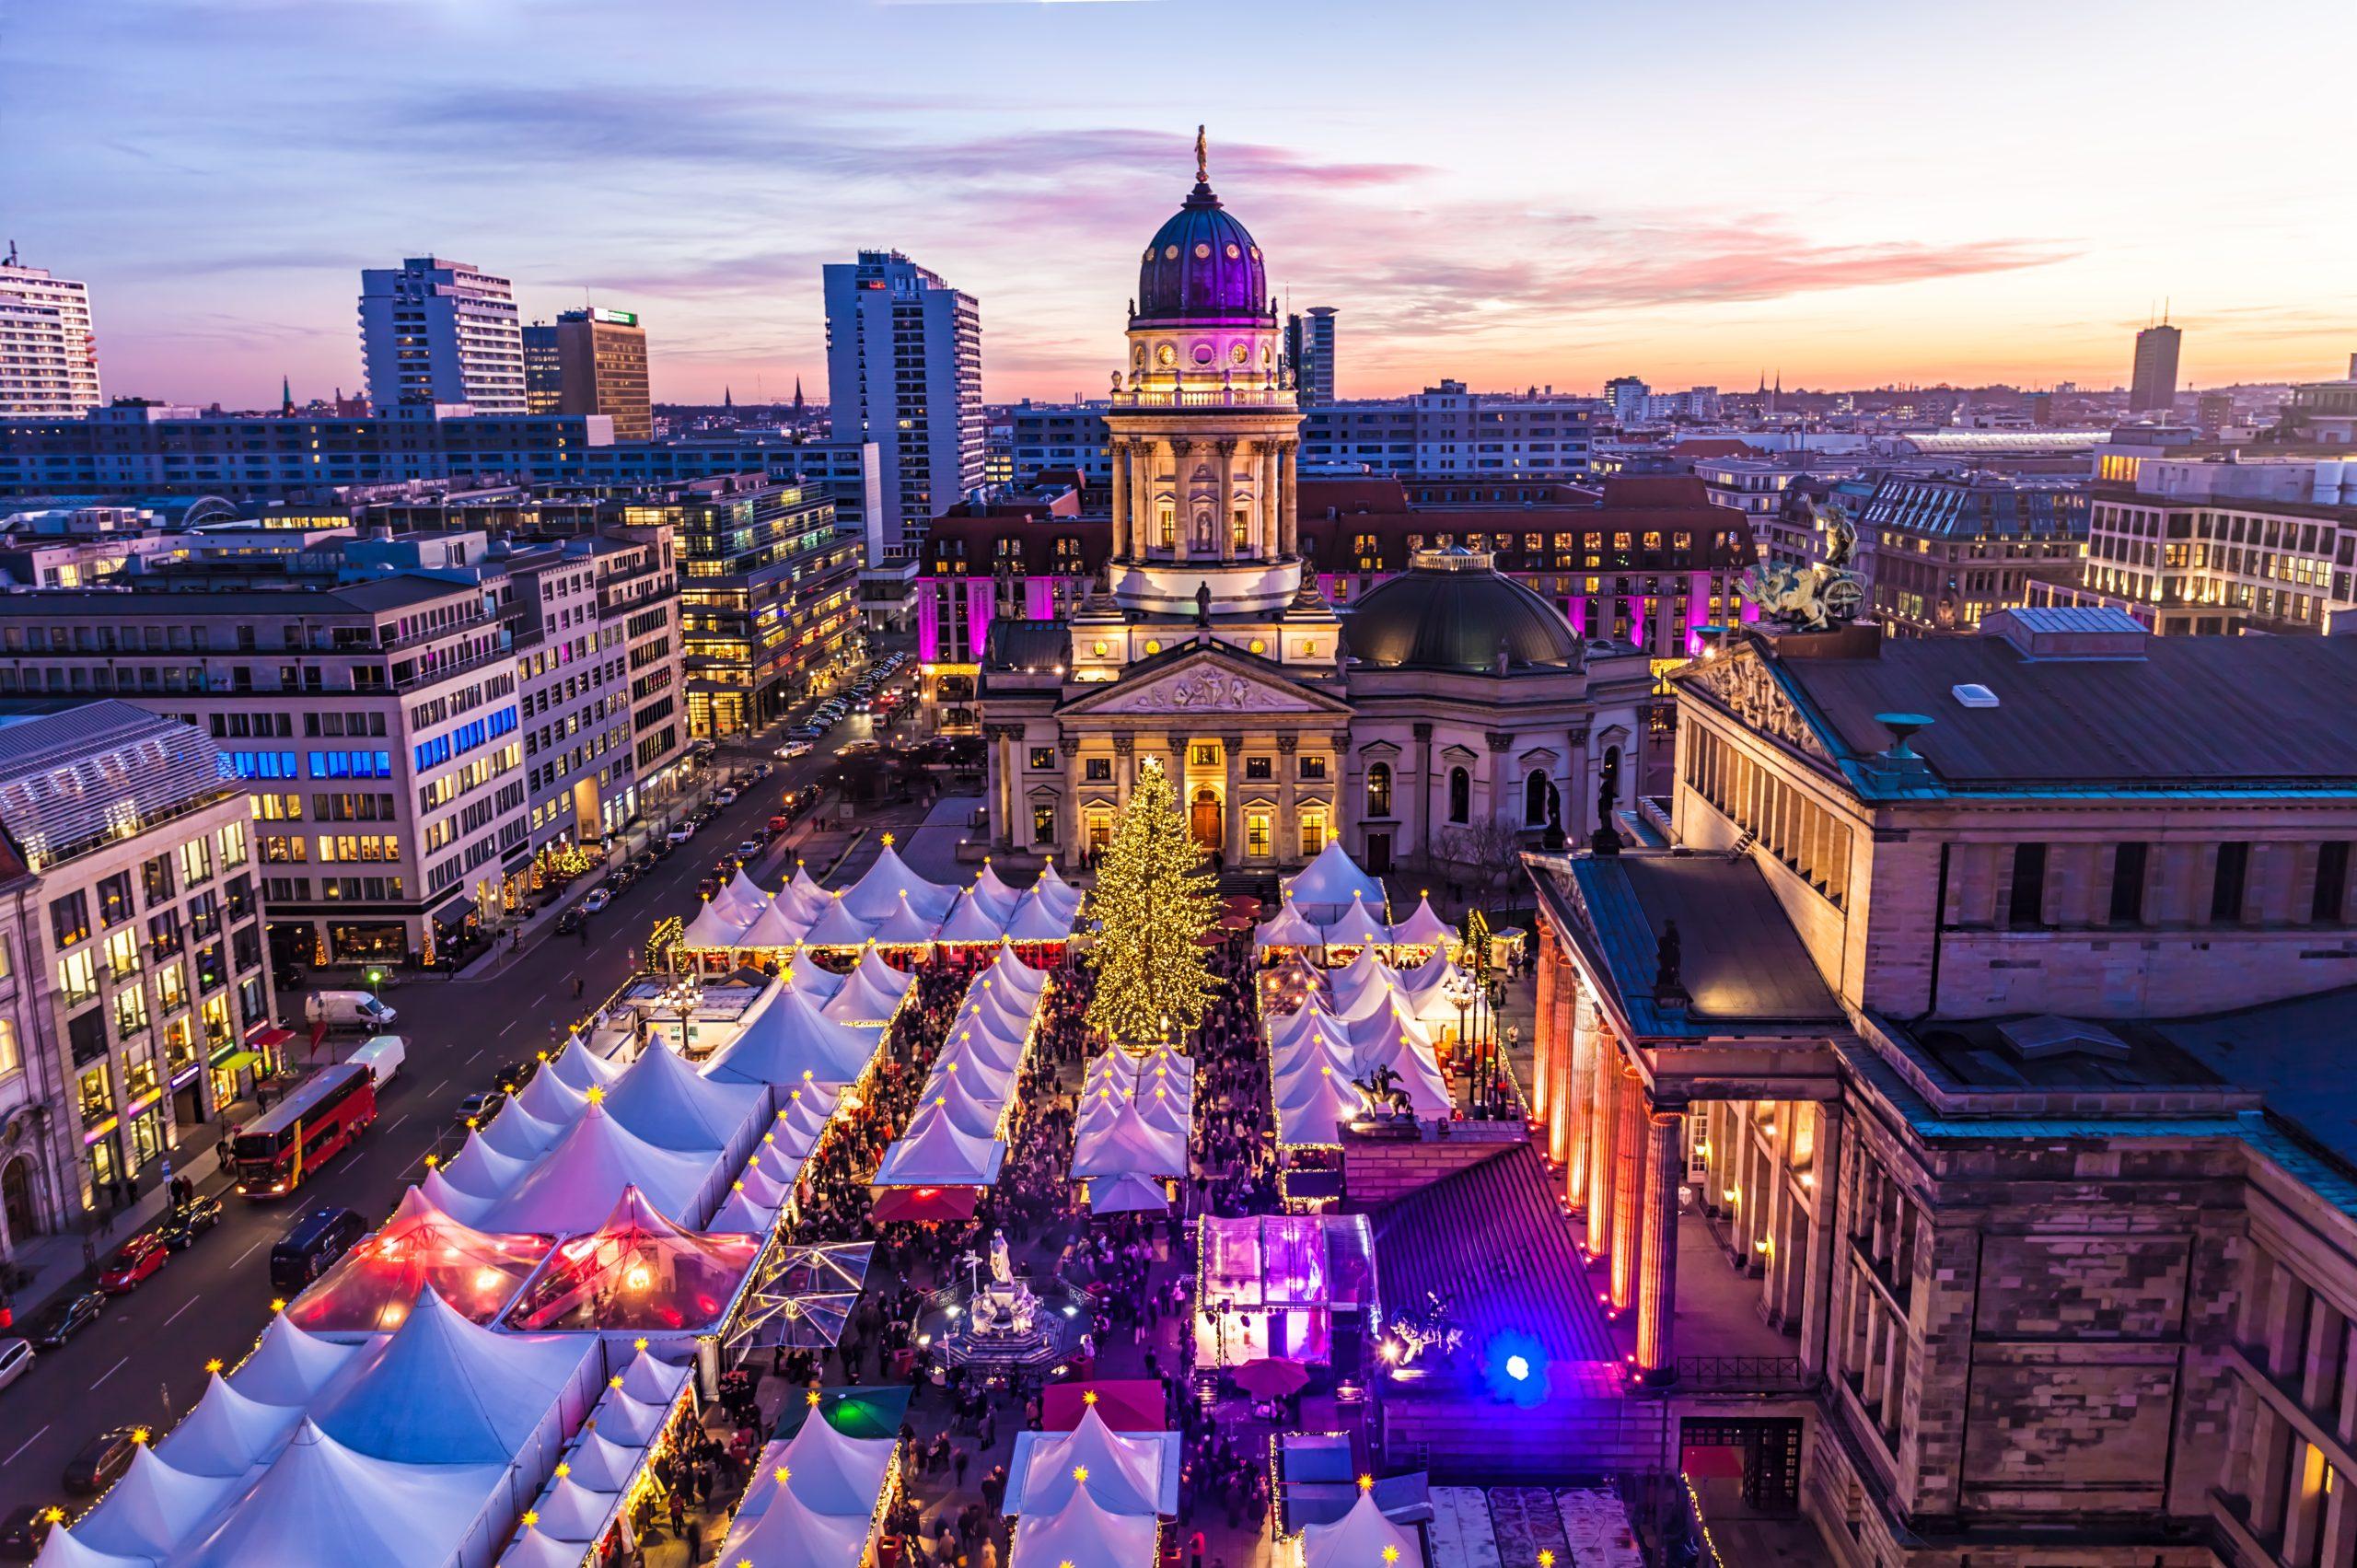 Julemarked på Gendarmenmarkt i Berlin. Pressefoto fra Getty Images via Tysk Turist Information.